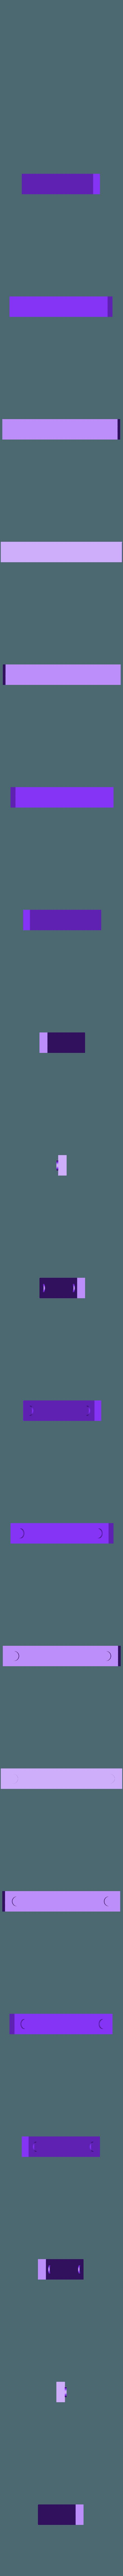 pcb_holder_3.STL Download free STL file PCB HOLDER Evo • 3D printer model, TheTNR